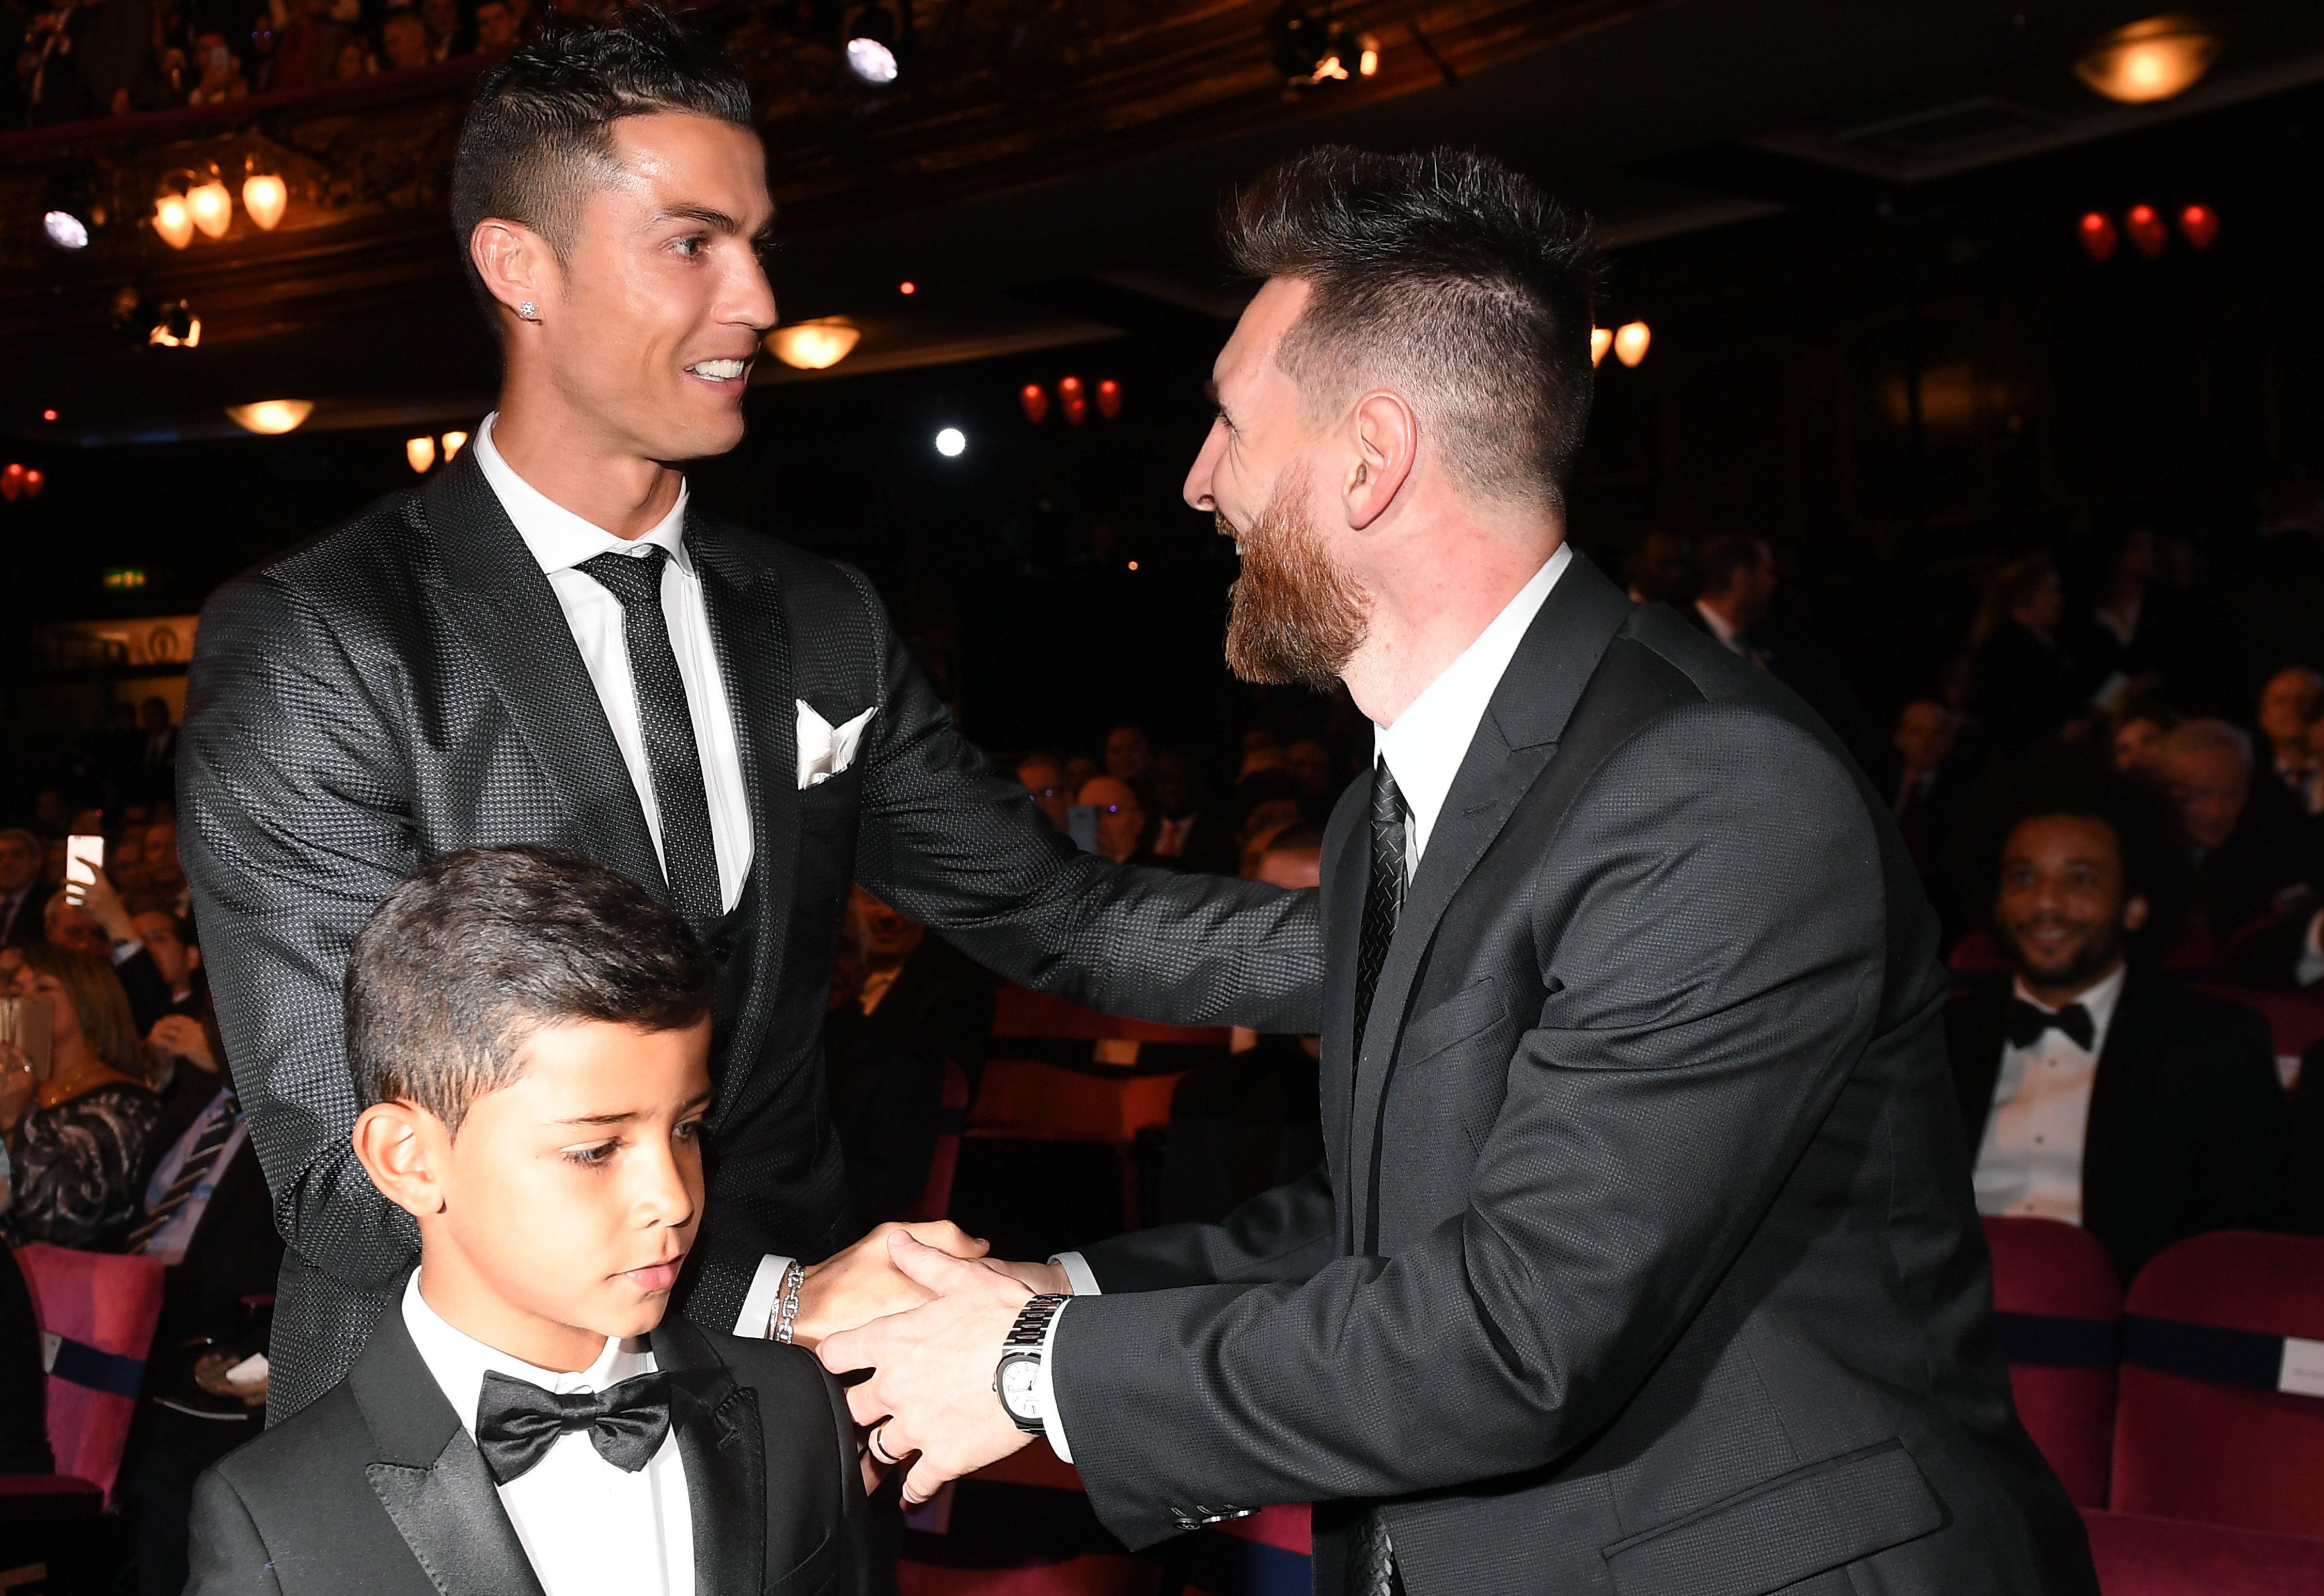 Cristiano Ronaldo made sure to mention rival Lionel Messi in his acceptance speech